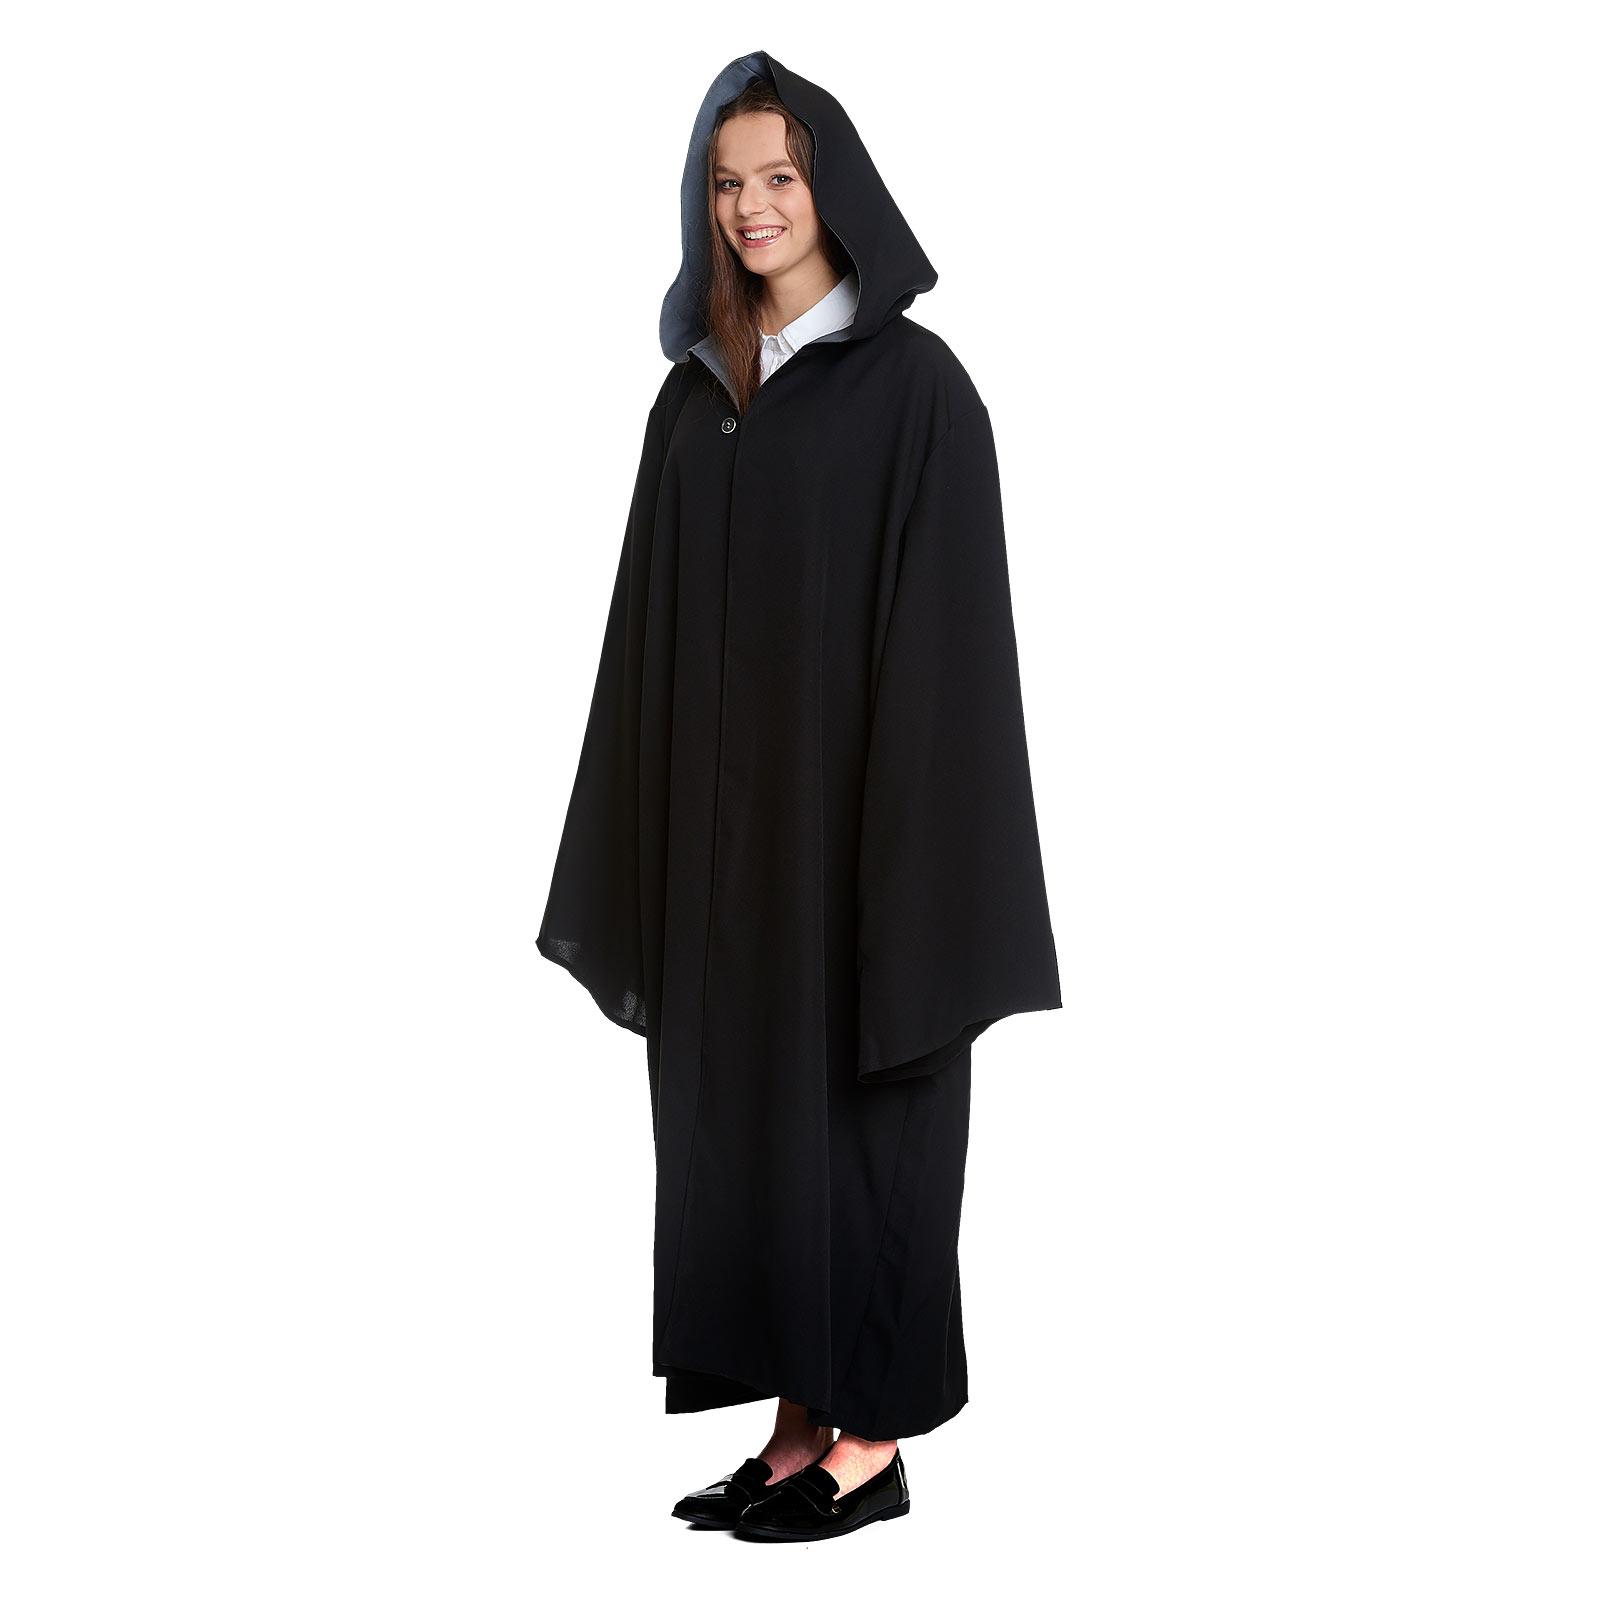 Zauberer Kostüm Robe mit Kapuze für Harry Potter Fans